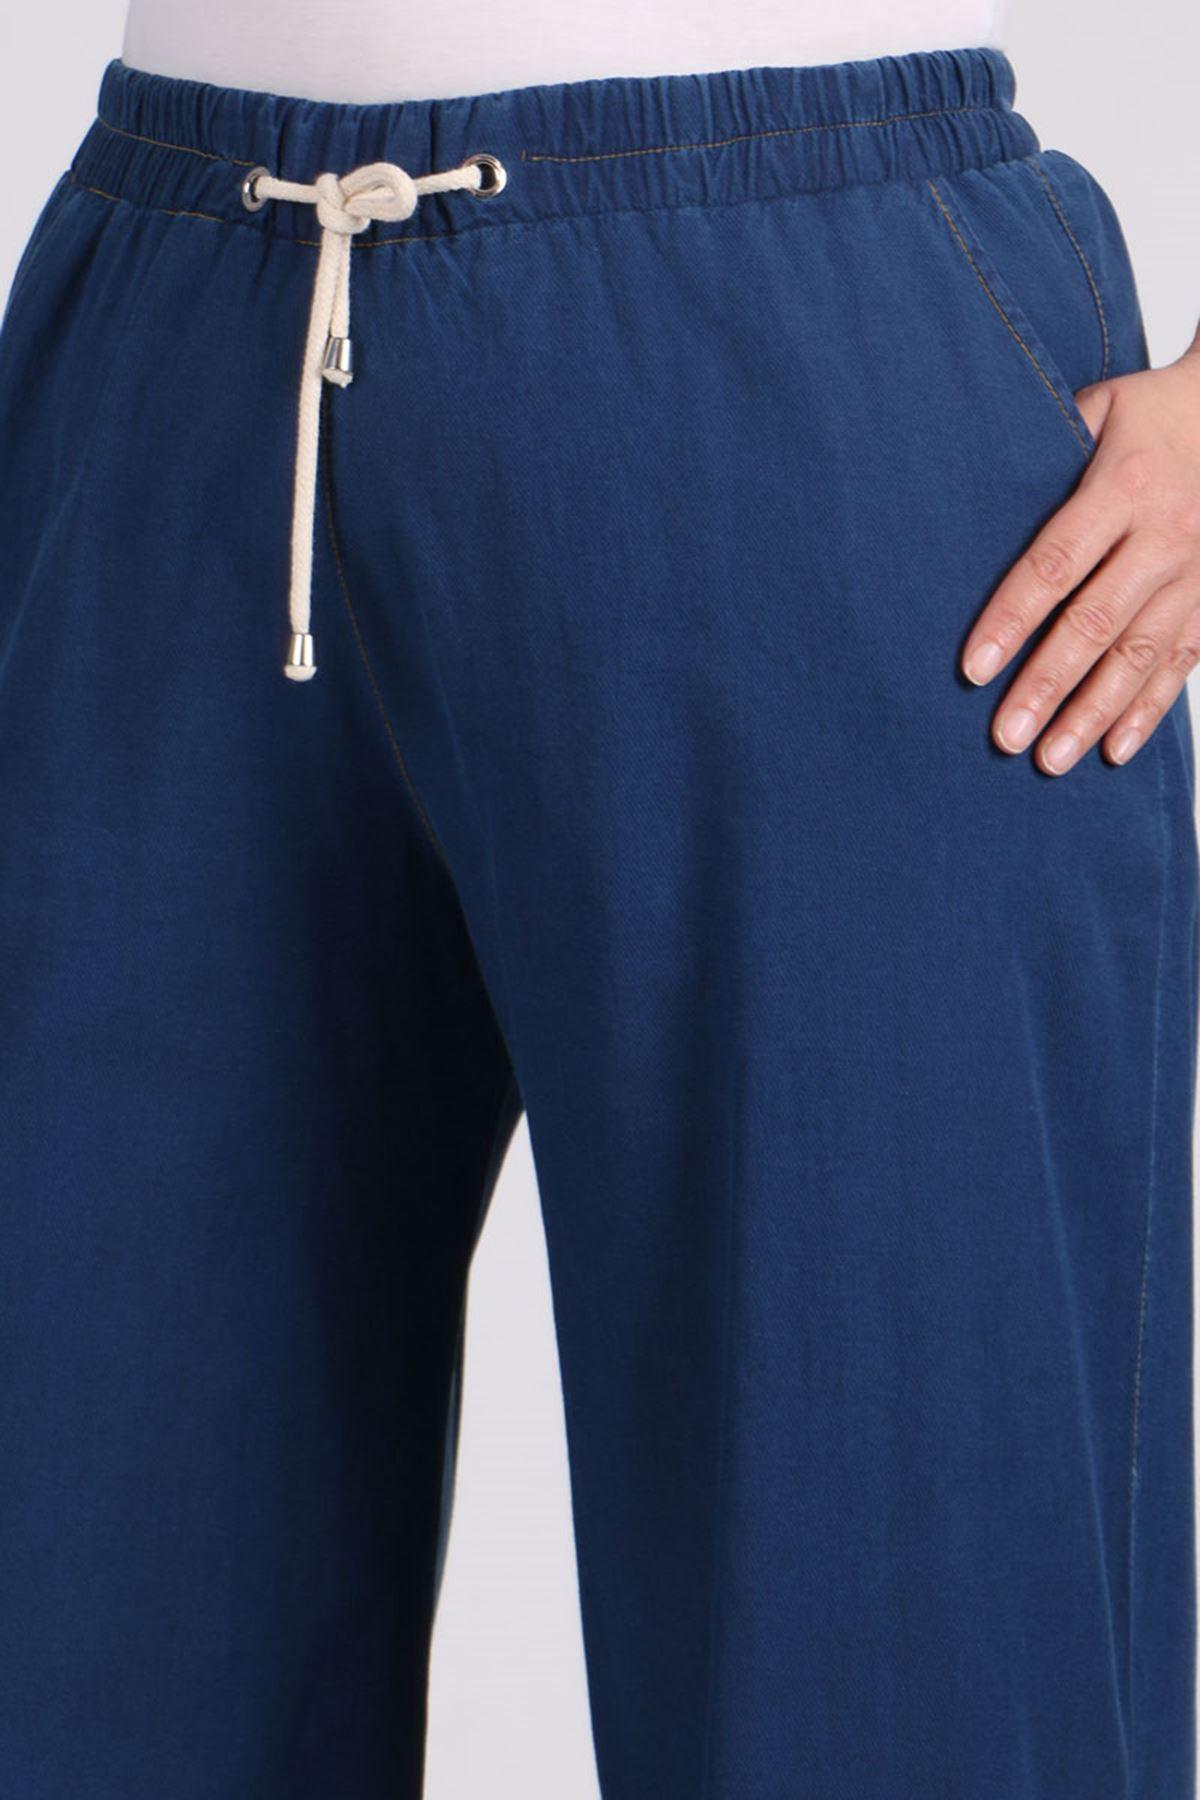 9155 Büyük Beden Beli Lastikli Bol Paça Kot Pantolon - Koyu Mavi